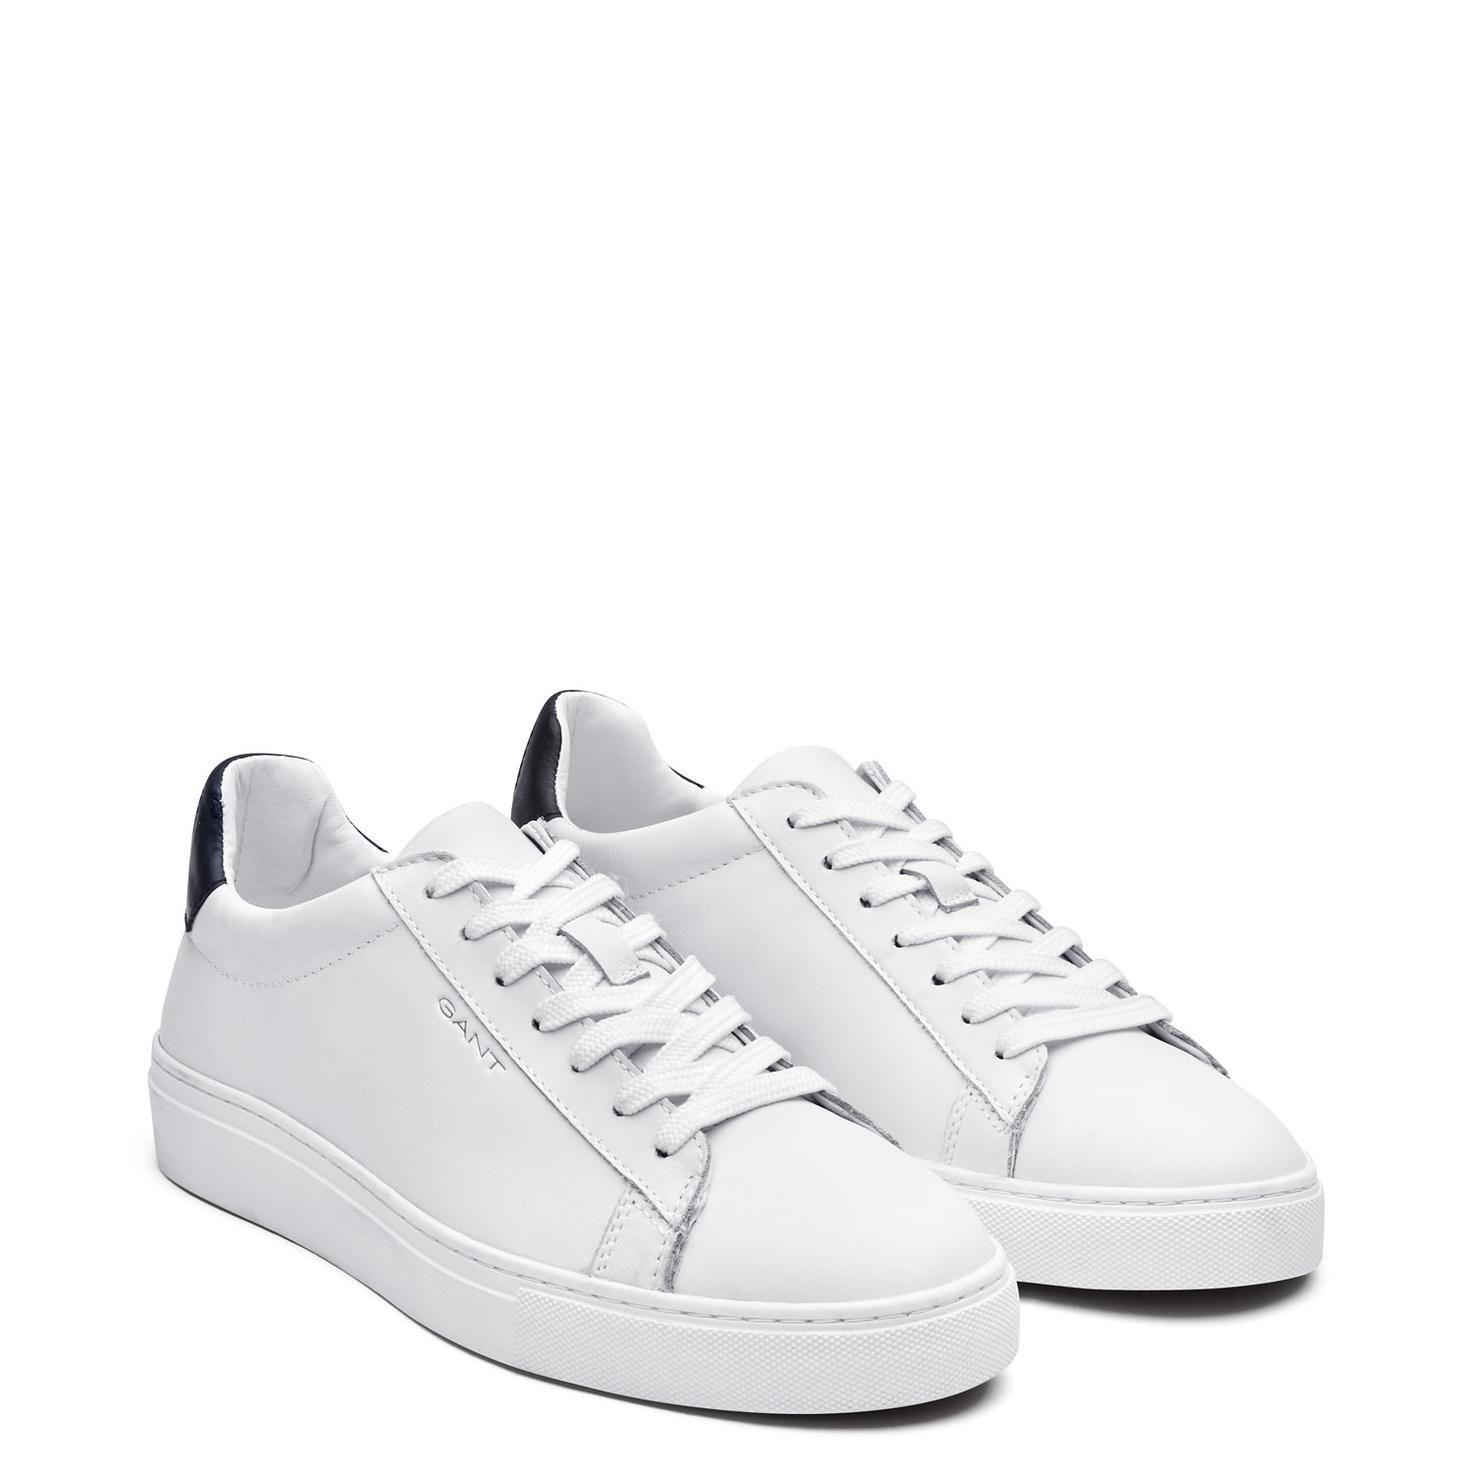 GANT Major Leather Sneaker | Sneakers